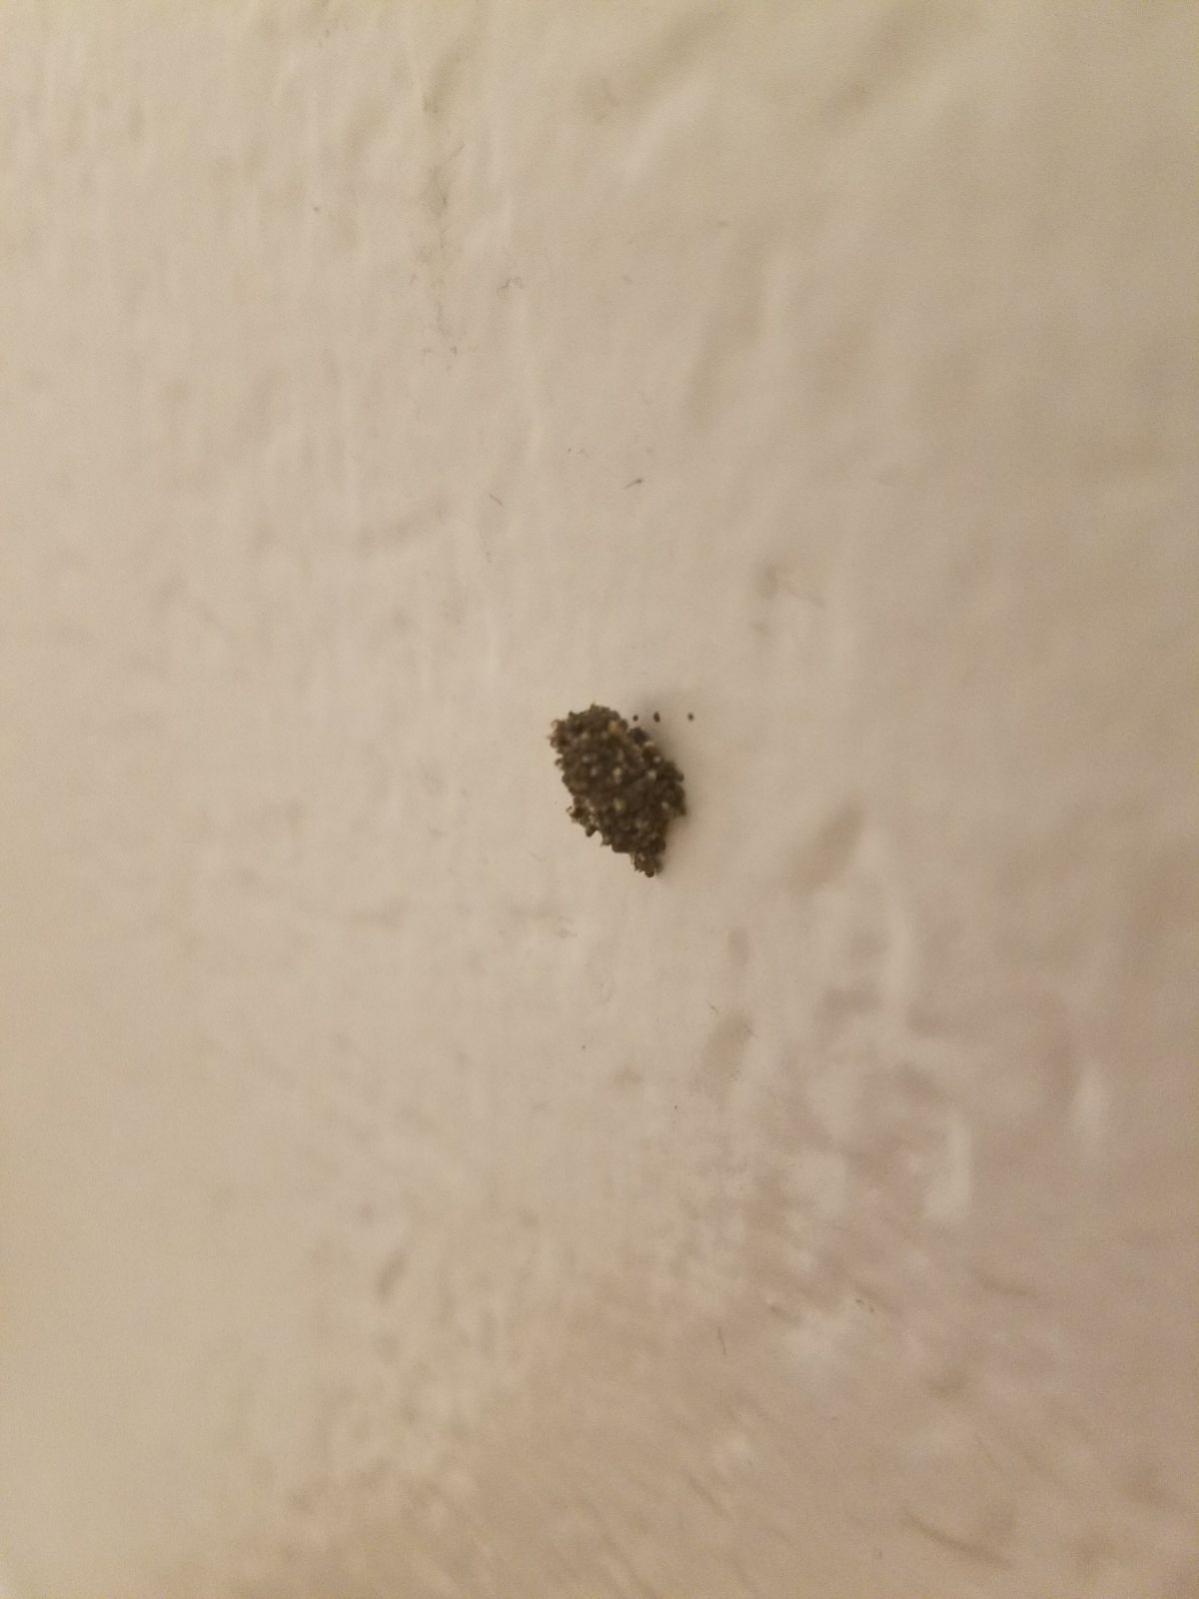 Whats Causing Black Holes My Sheetrock Wall Doityourself